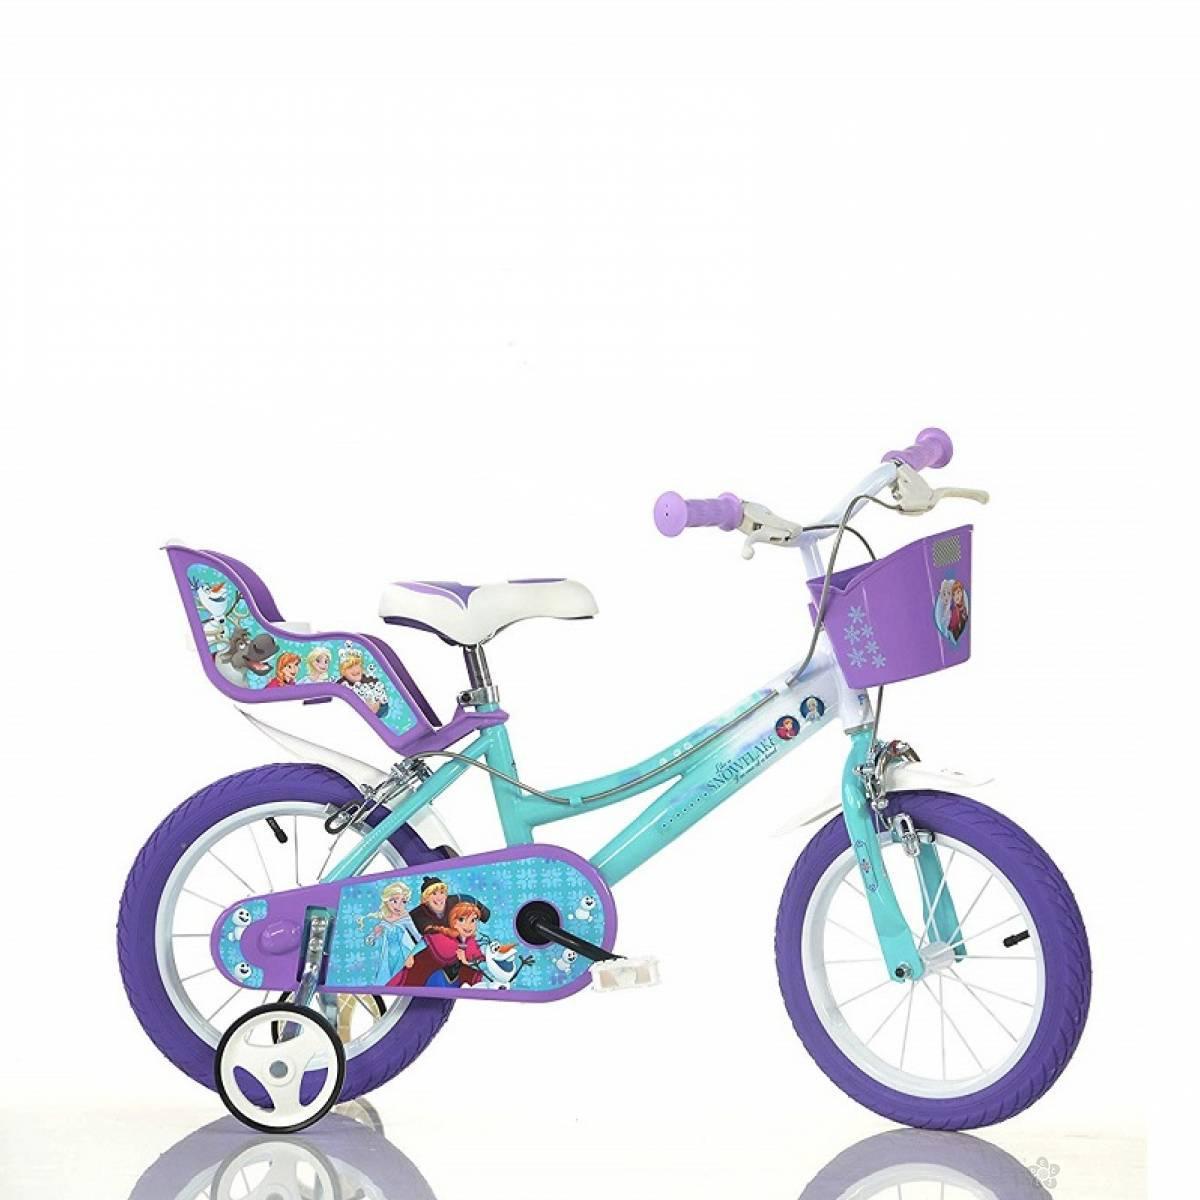 Dečiji Bicikl Snow Princess model 716-12 CRVENI